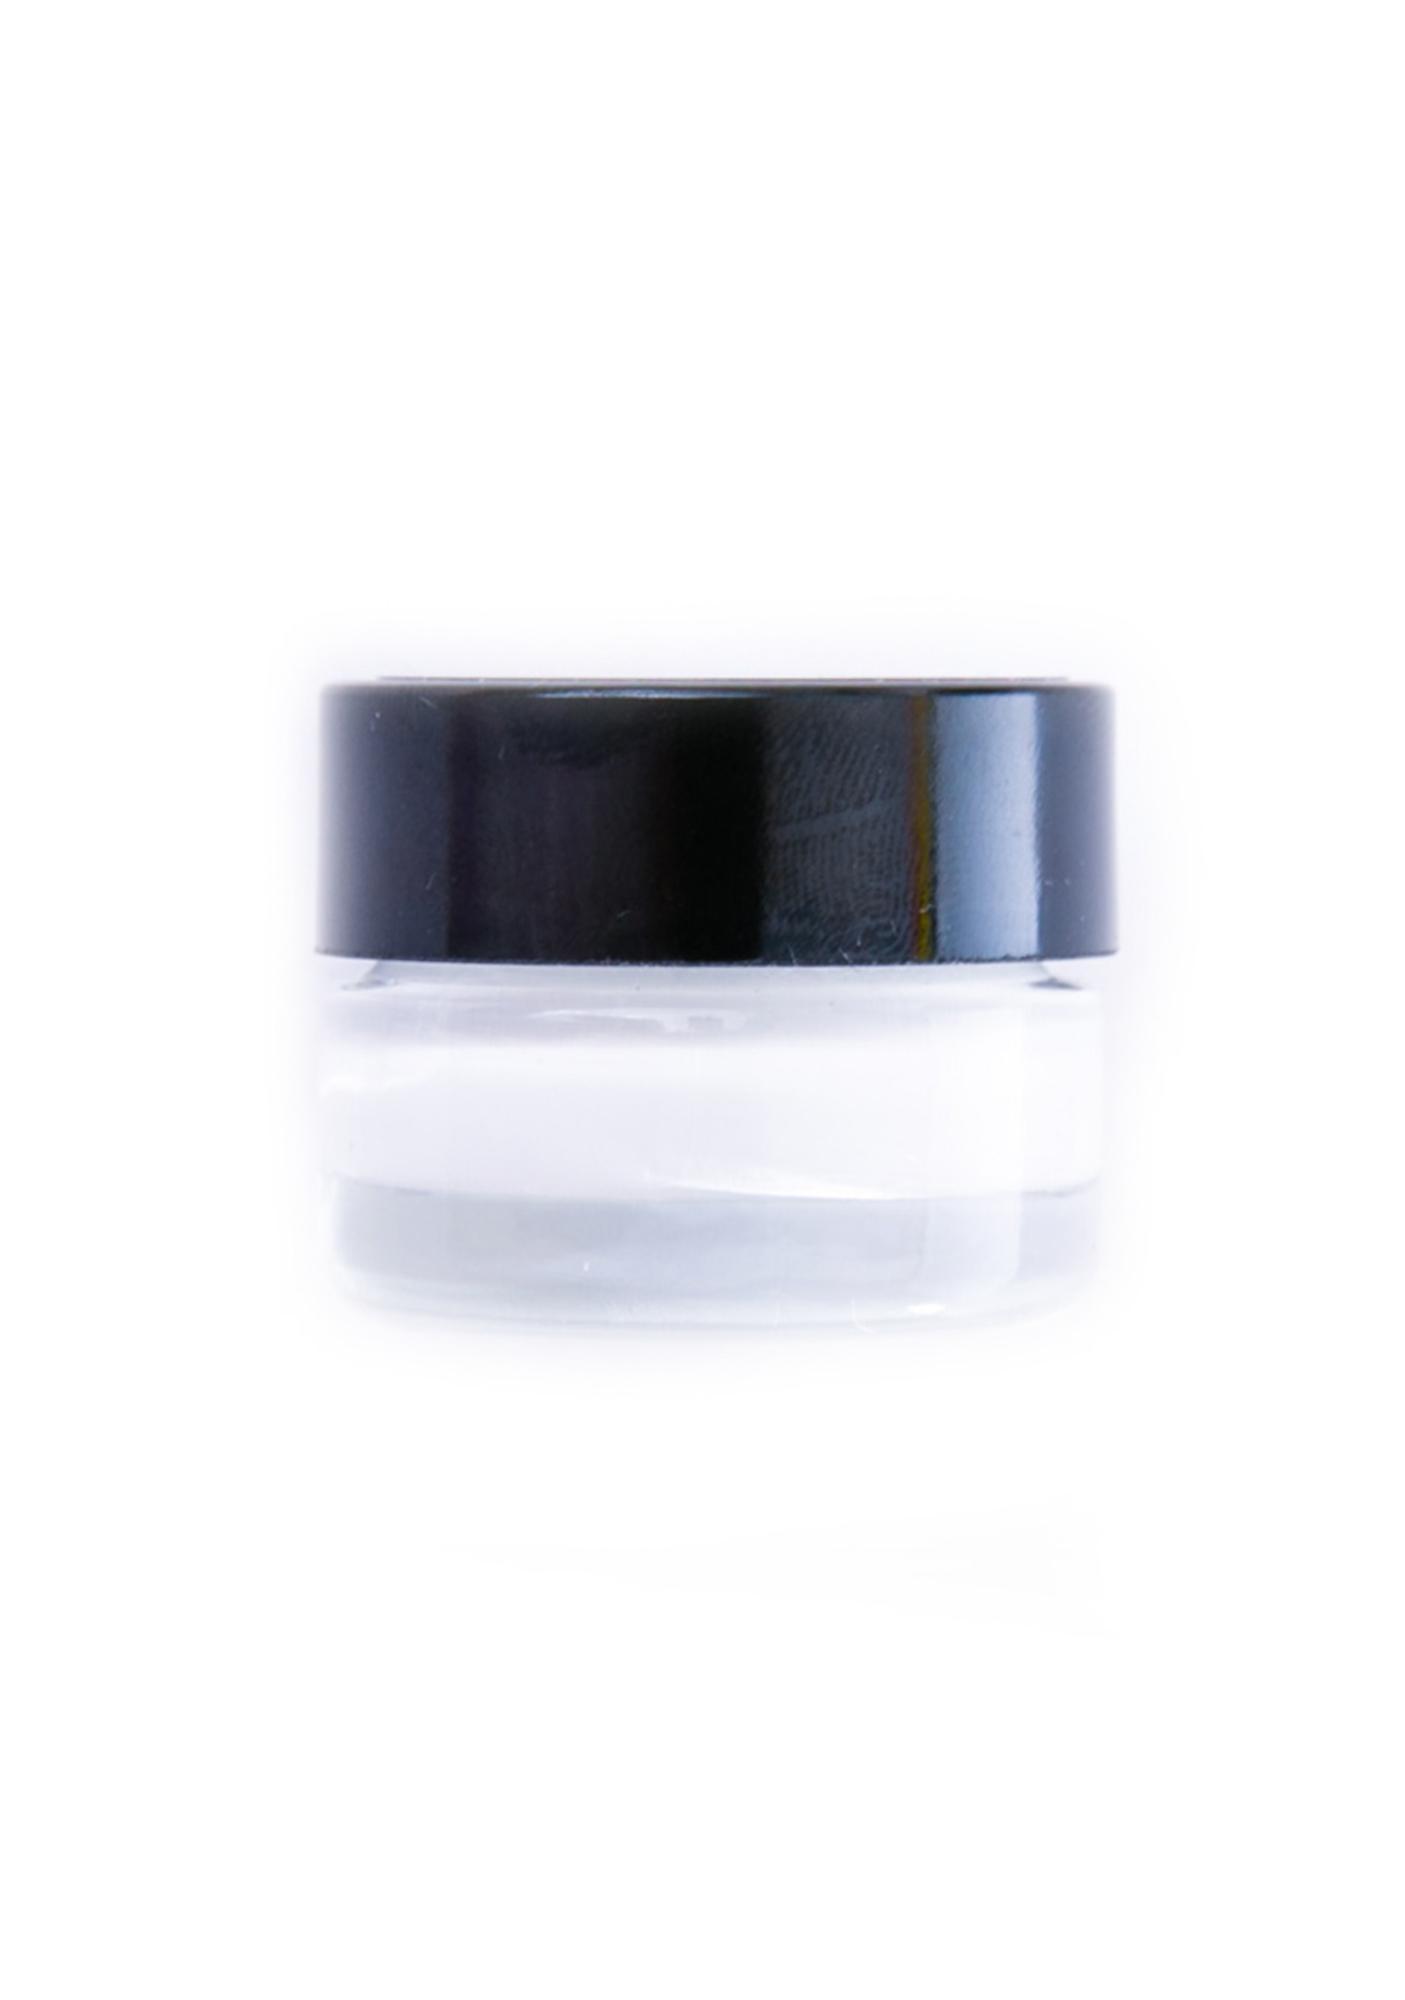 Medusa's Makeup Eyeliner Paint